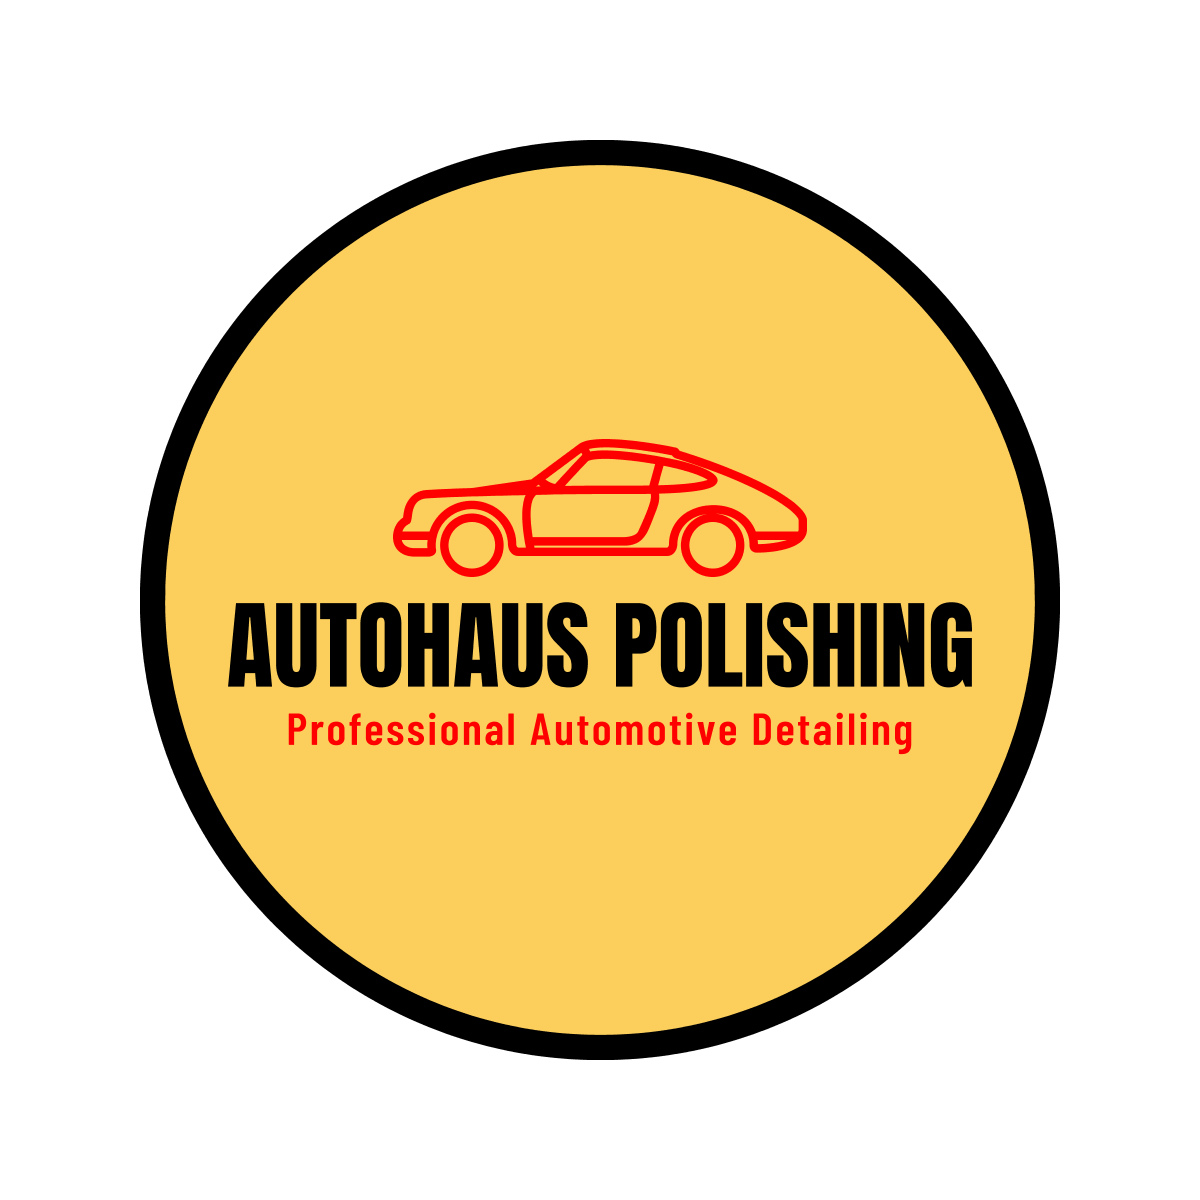 Autohaus Polishing | Car Detailing in Santa Clarita